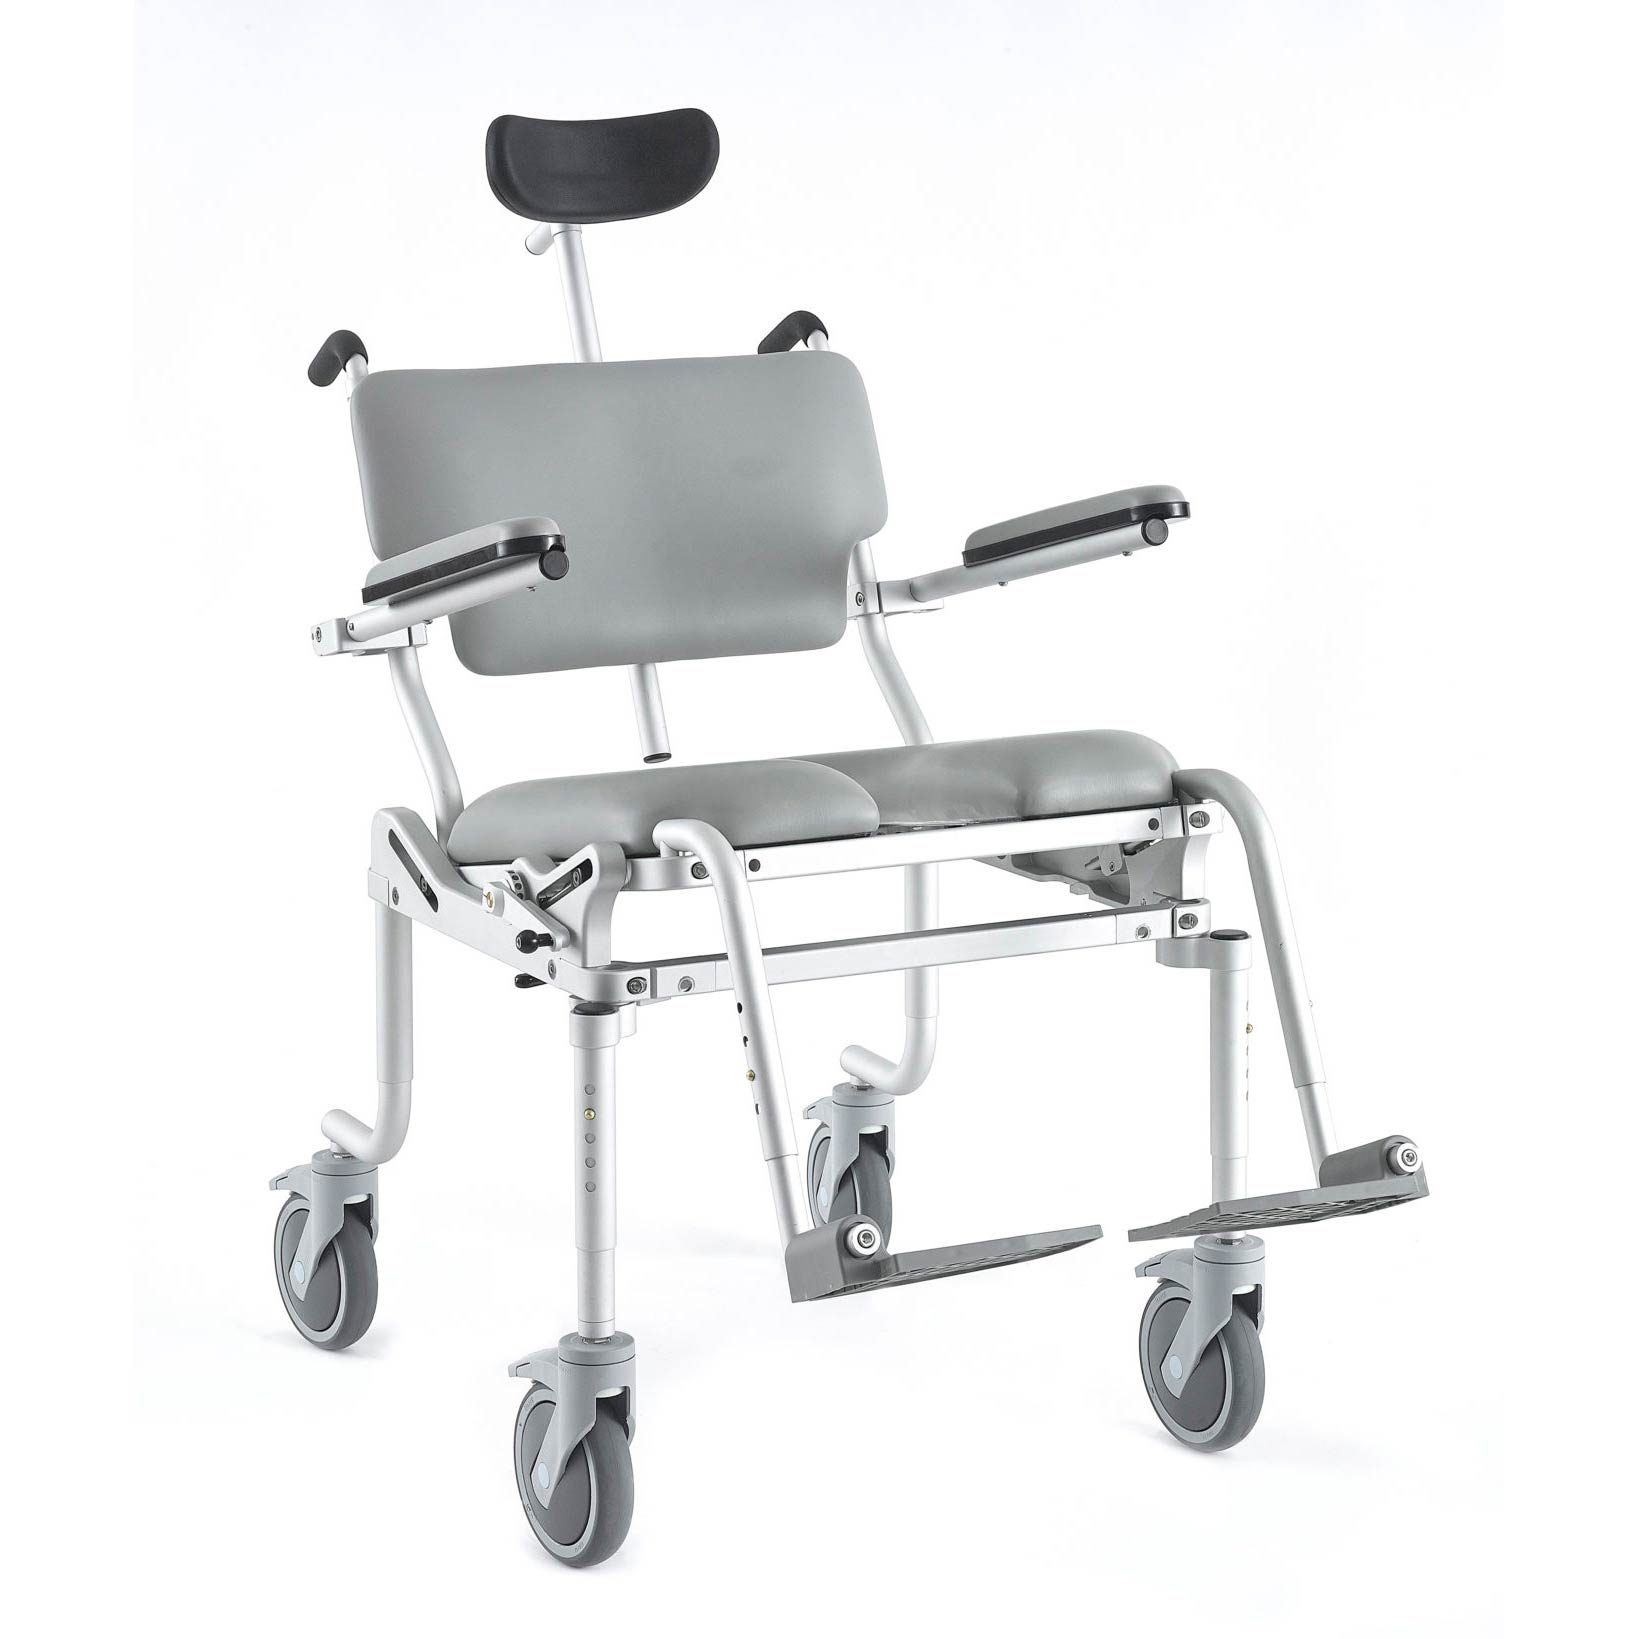 Nuprodx 4200 Tilt Roll-In-Shower Commode Chair   Medicaleshop